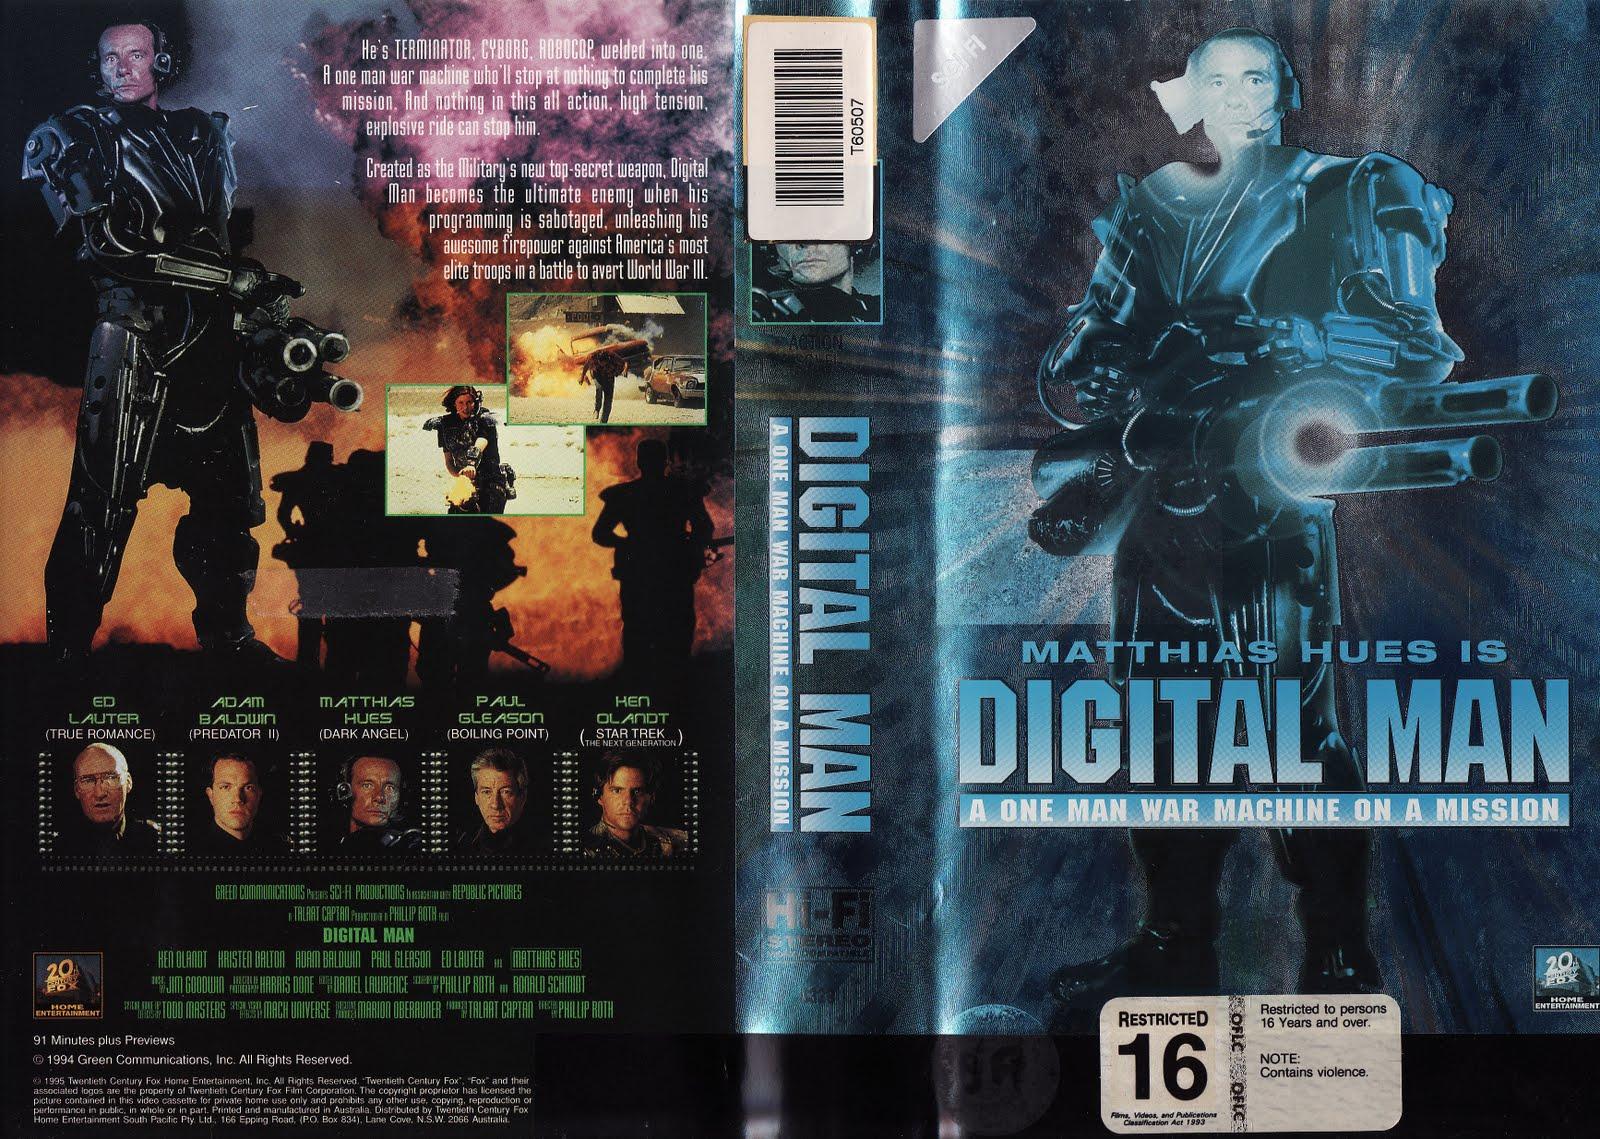 Movie digital man